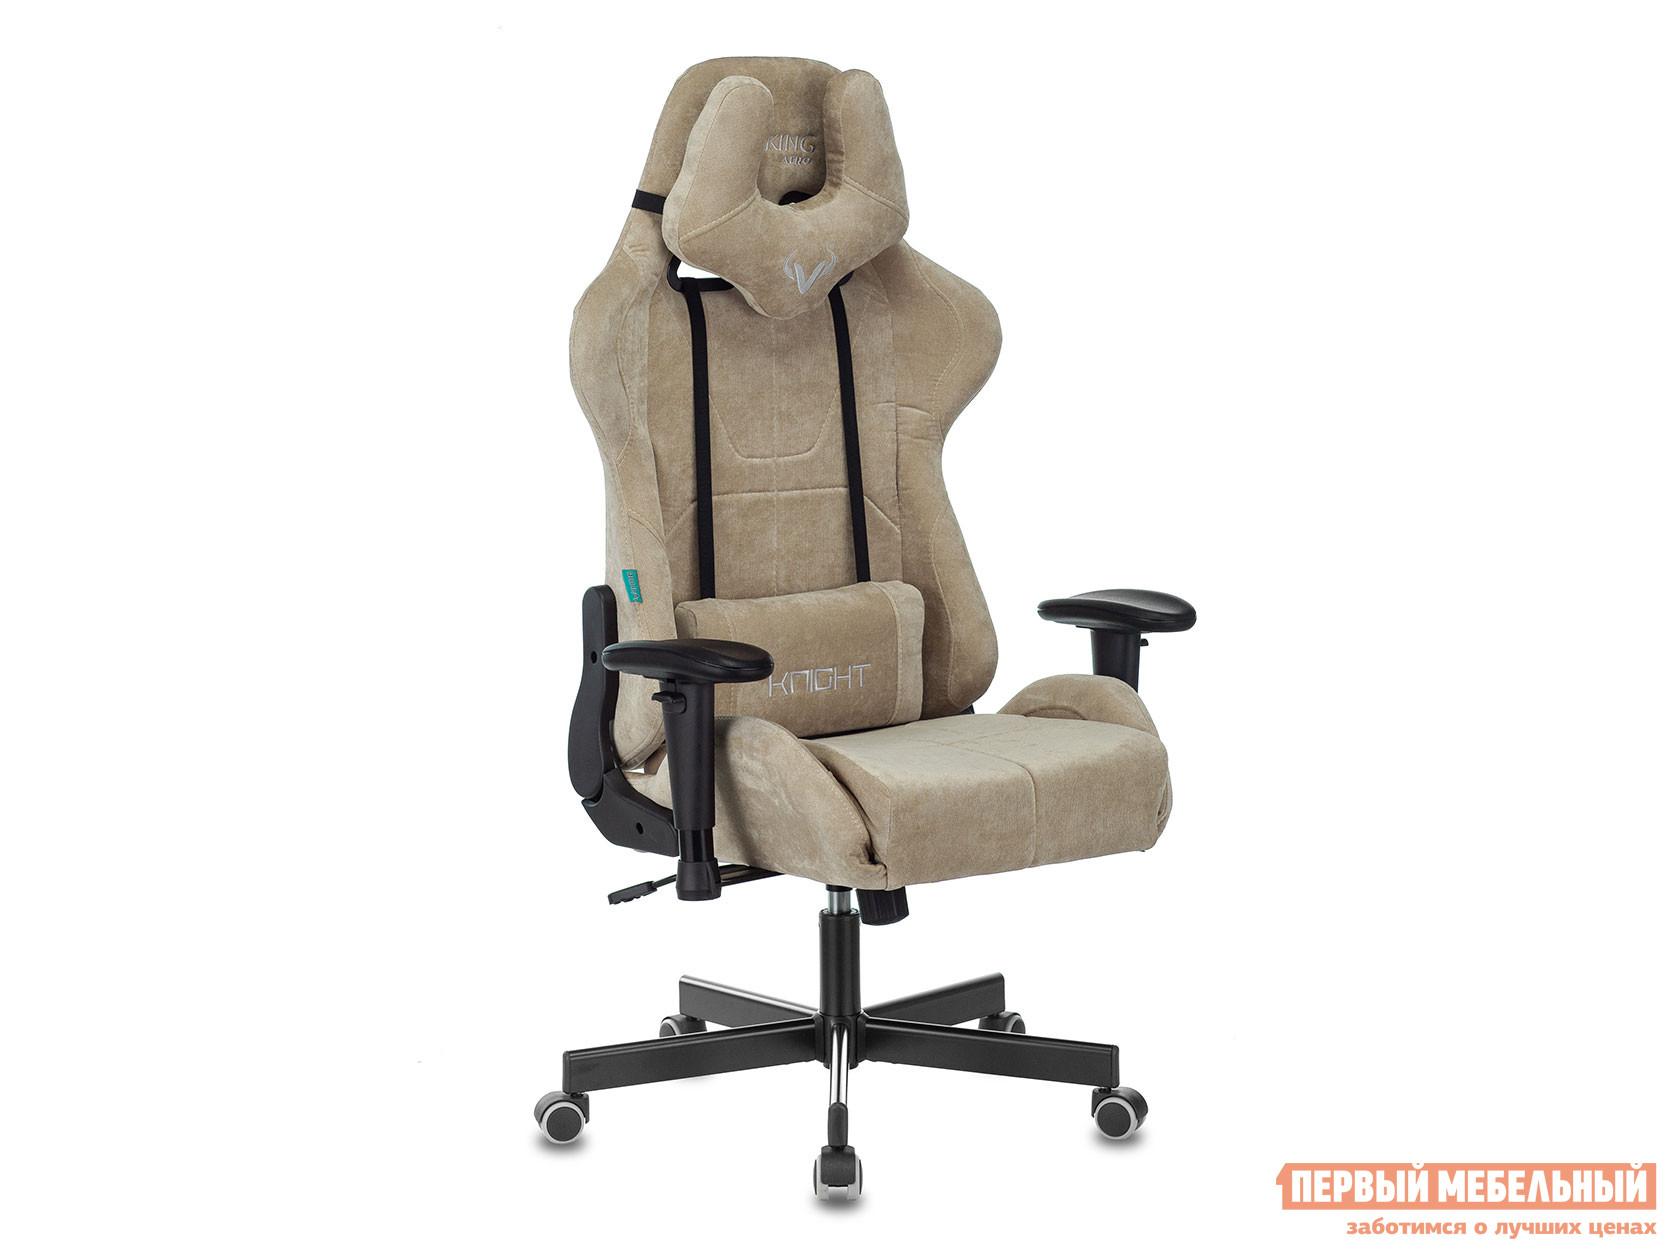 Игровое кресло Бюрократ Кресло игровое Бюрократ VIKING KNIGHT LT кресло игровое dxracer dxracer drifting oh dj133 n